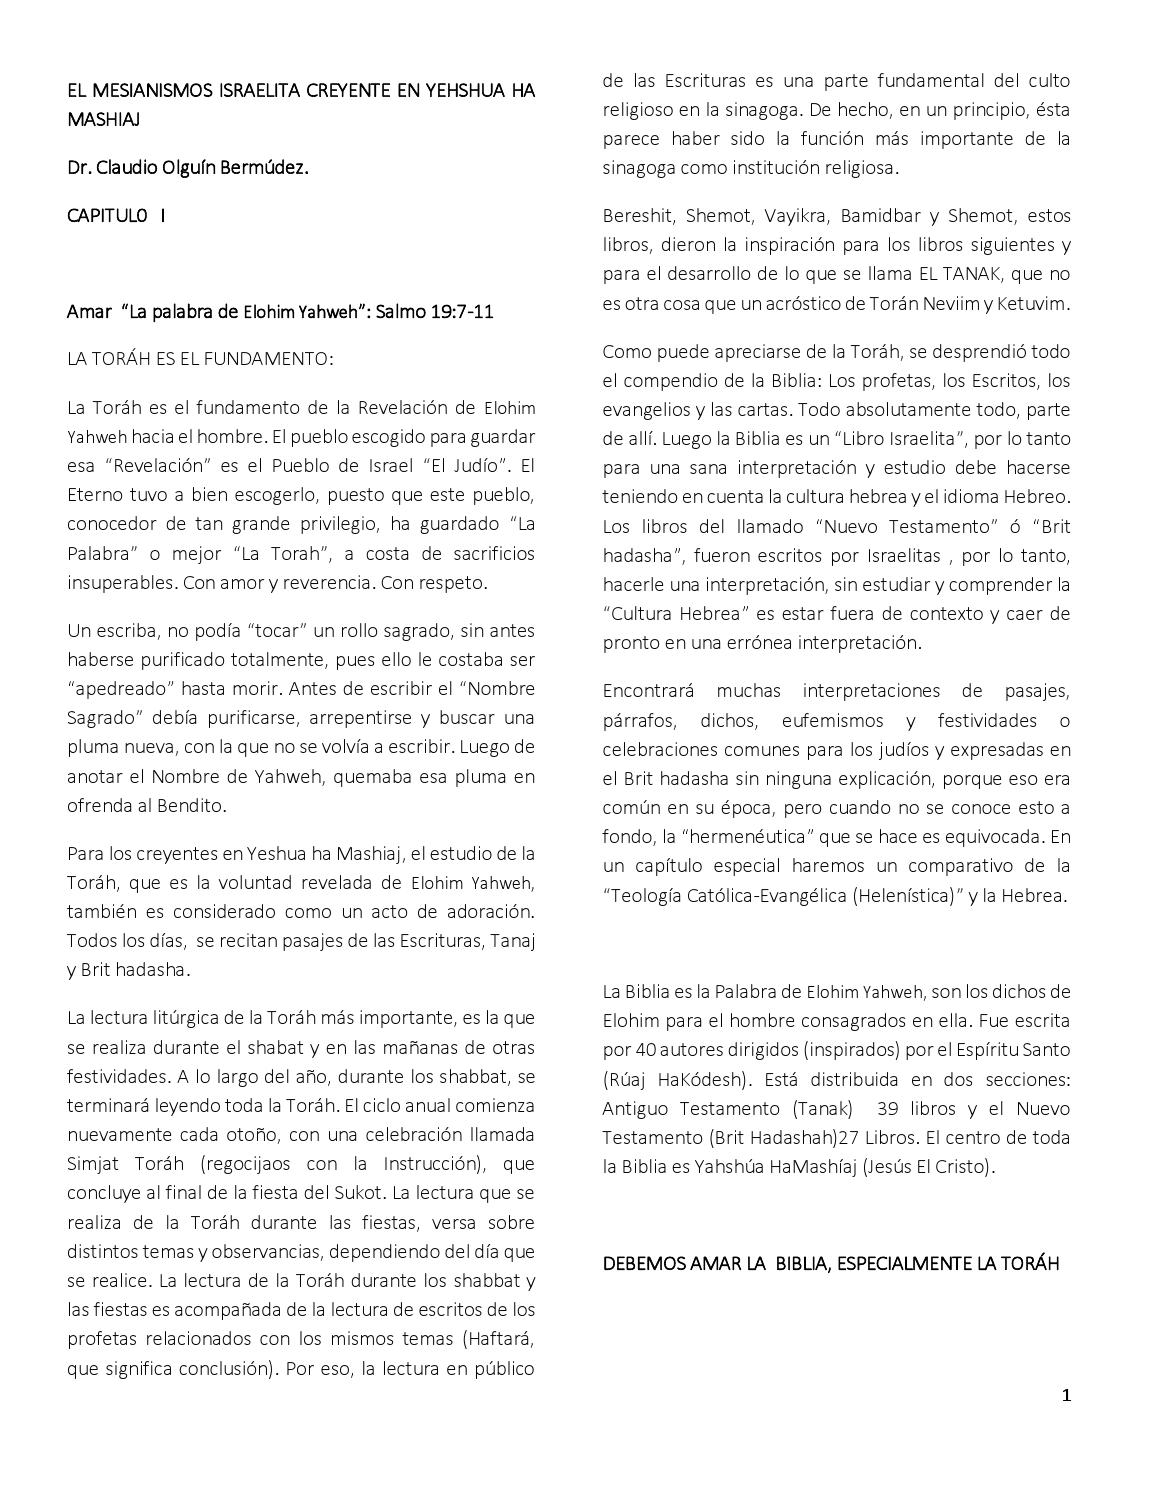 Creencia israelitas mesianicos by Claudio andres olguin - issuu